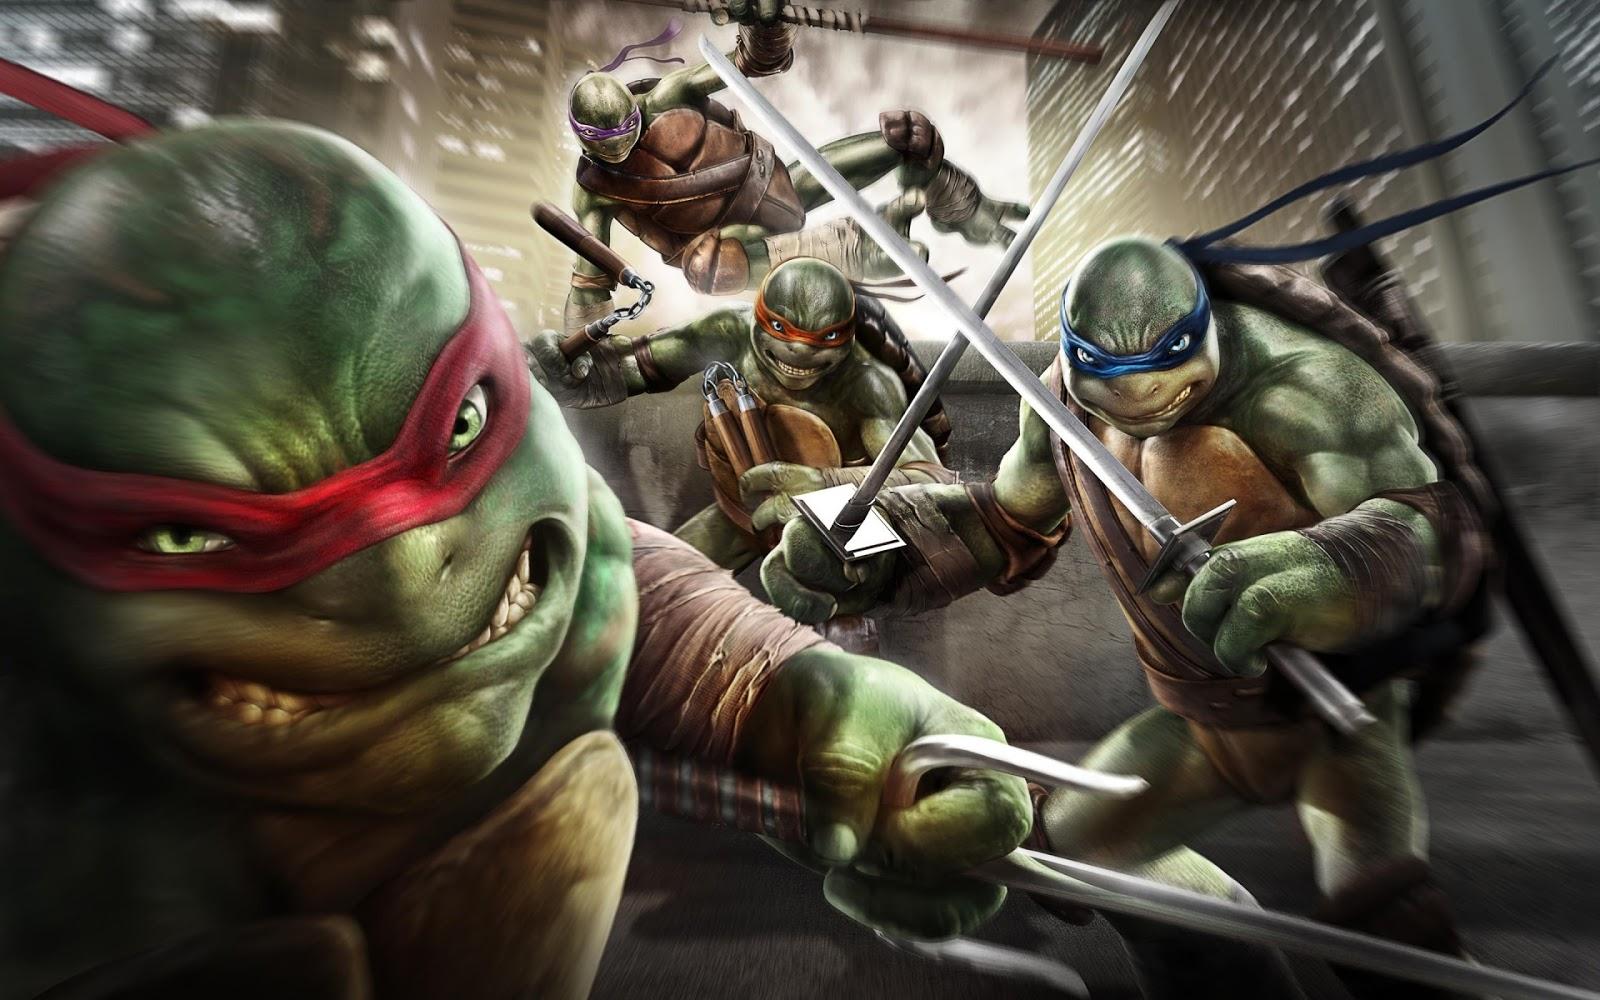 Cartaz do filme As Tartarugas Ninja: Fora das Sombras